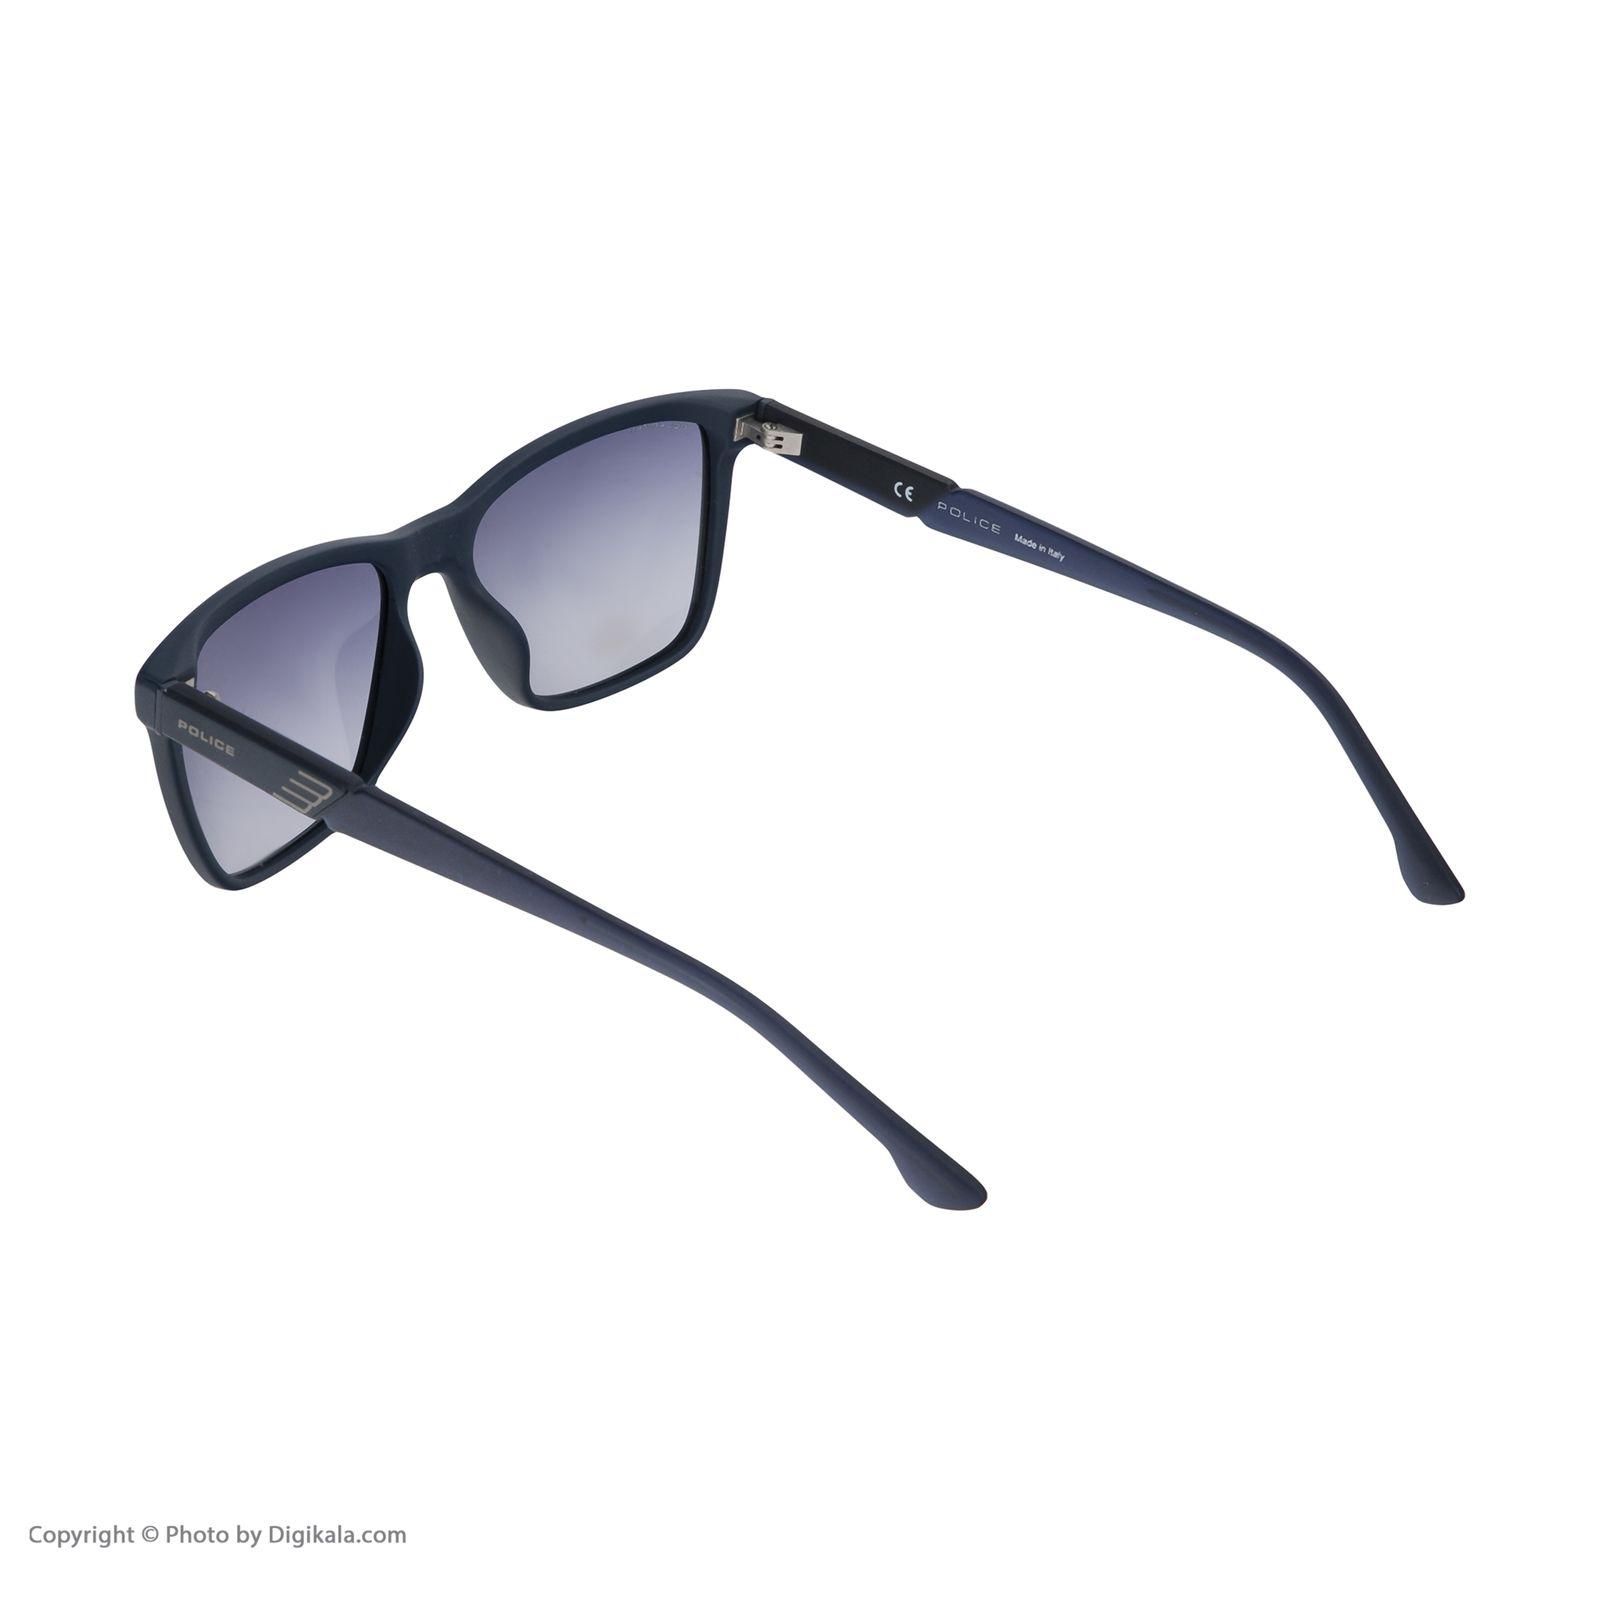 عینک آفتابی پلیس مدل SPL868M 477P -  - 5